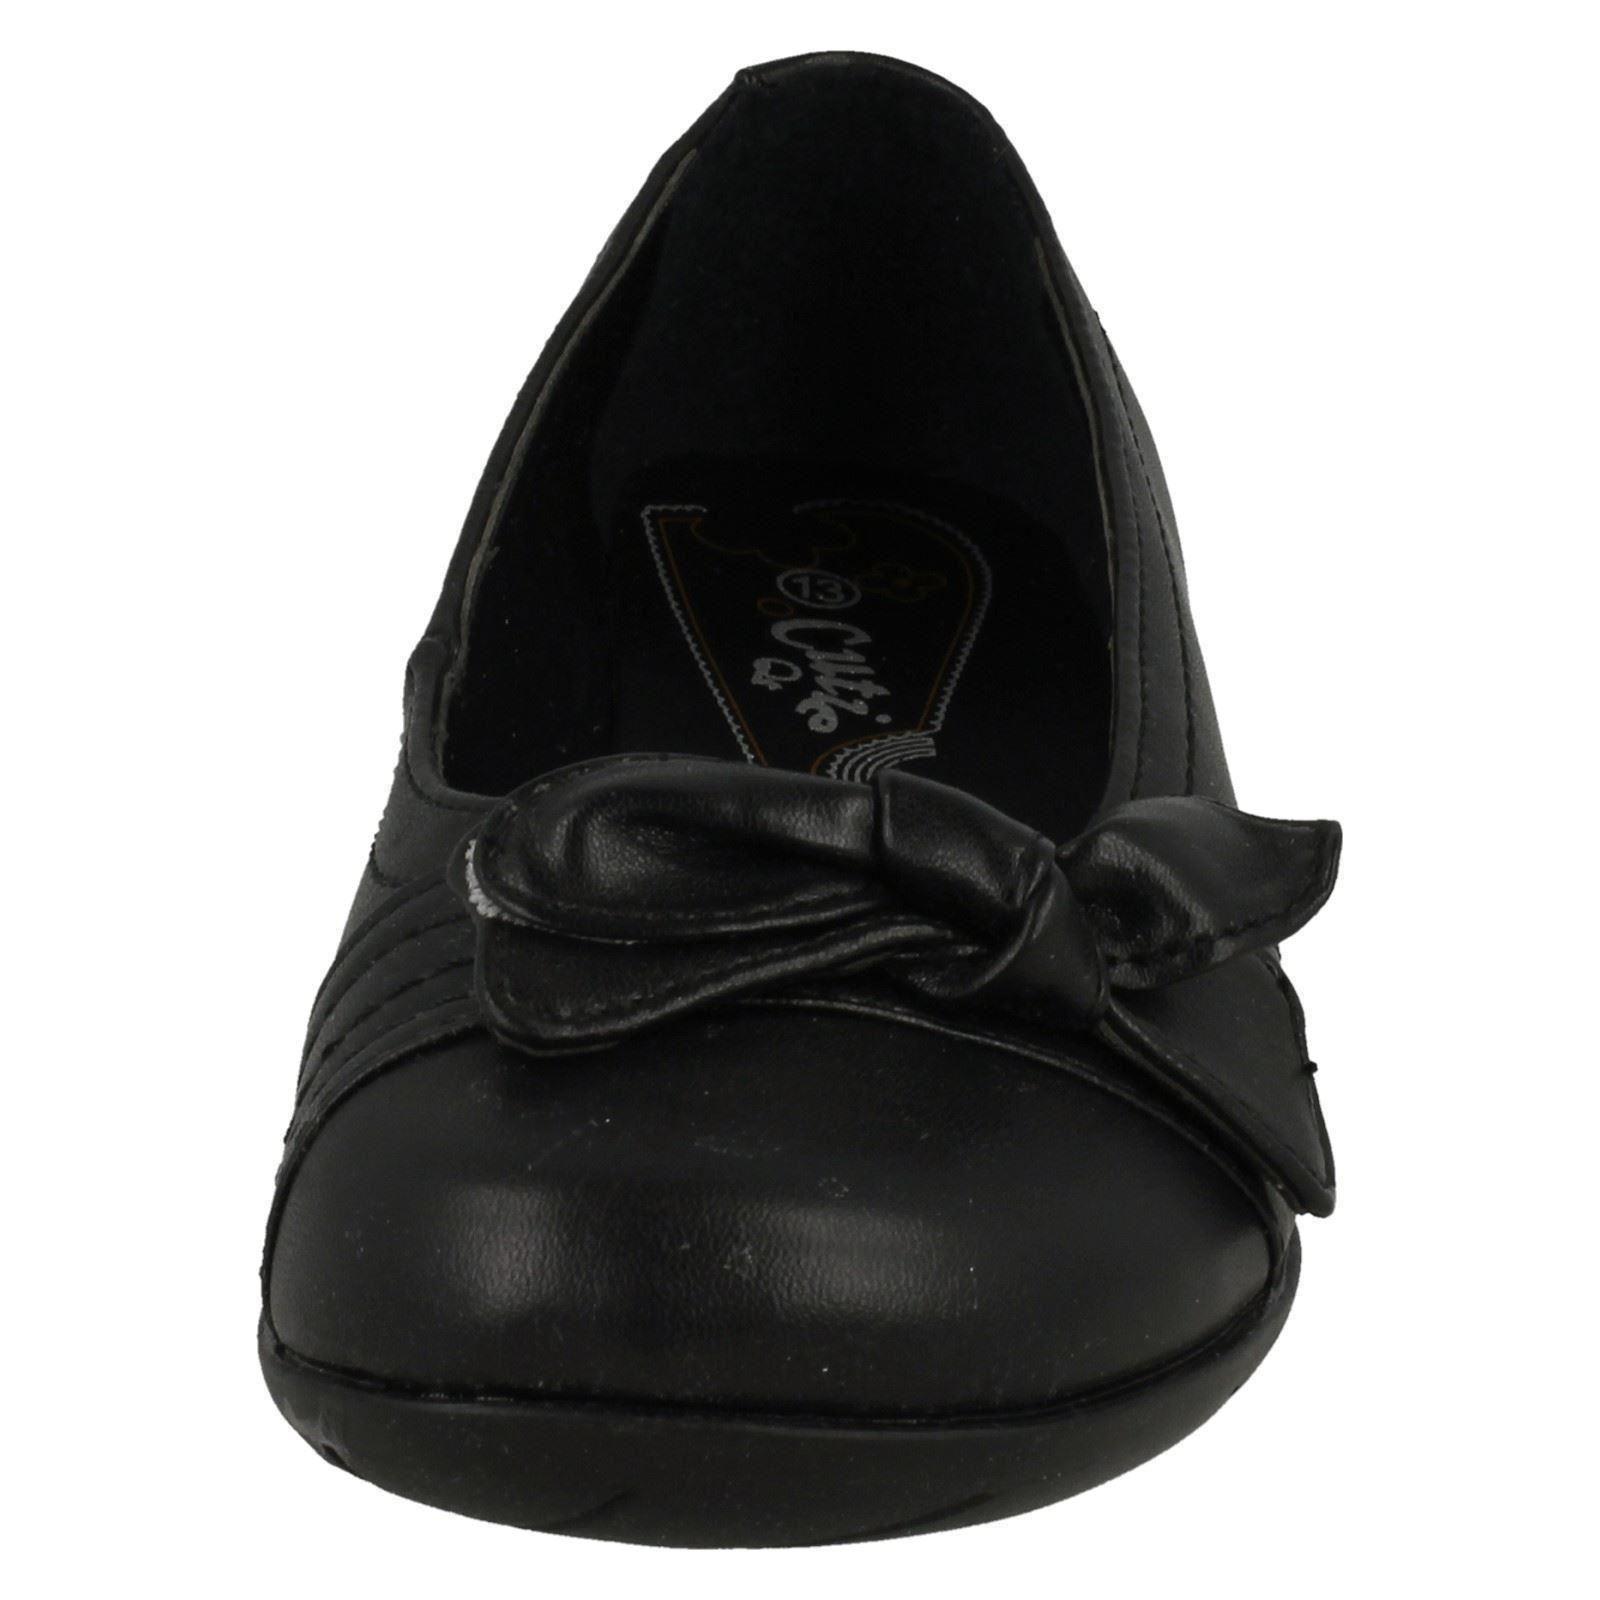 Chicas Cutie X3009 Resbalón en Zapatos Escolares Etiqueta ~ K